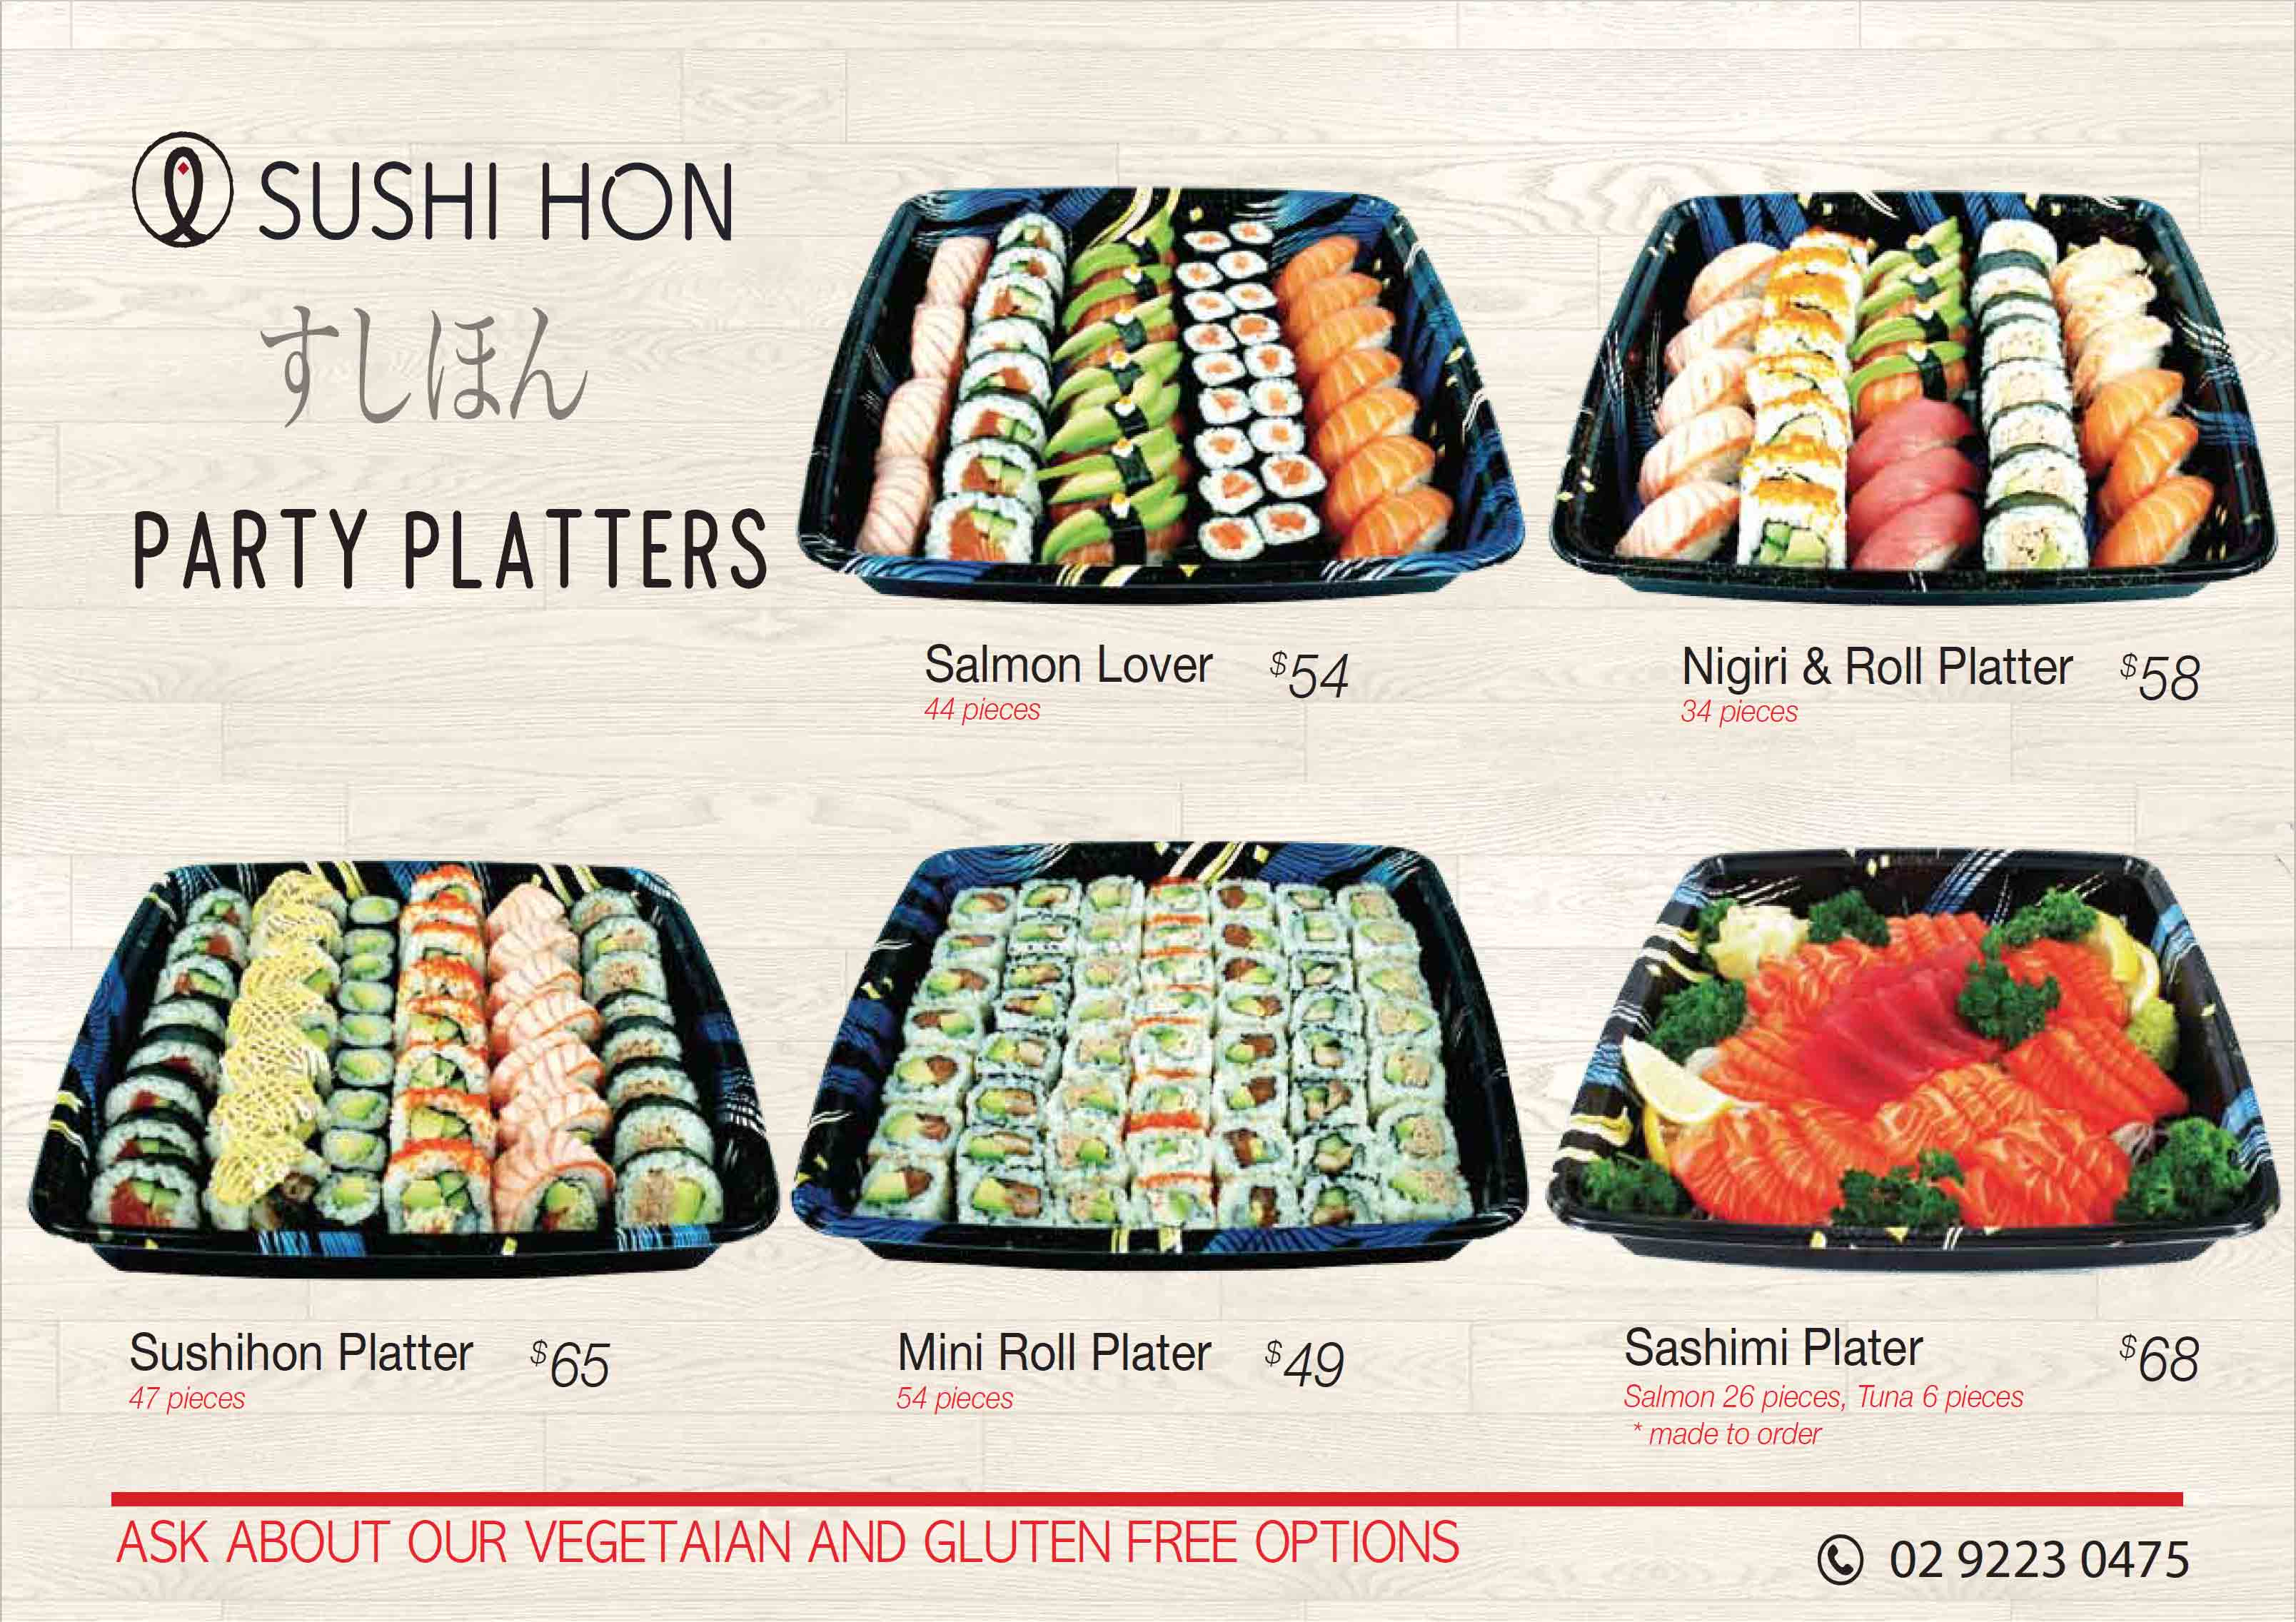 https://sushihon.com.au/wp-content/uploads/2016/06/catering.pdf